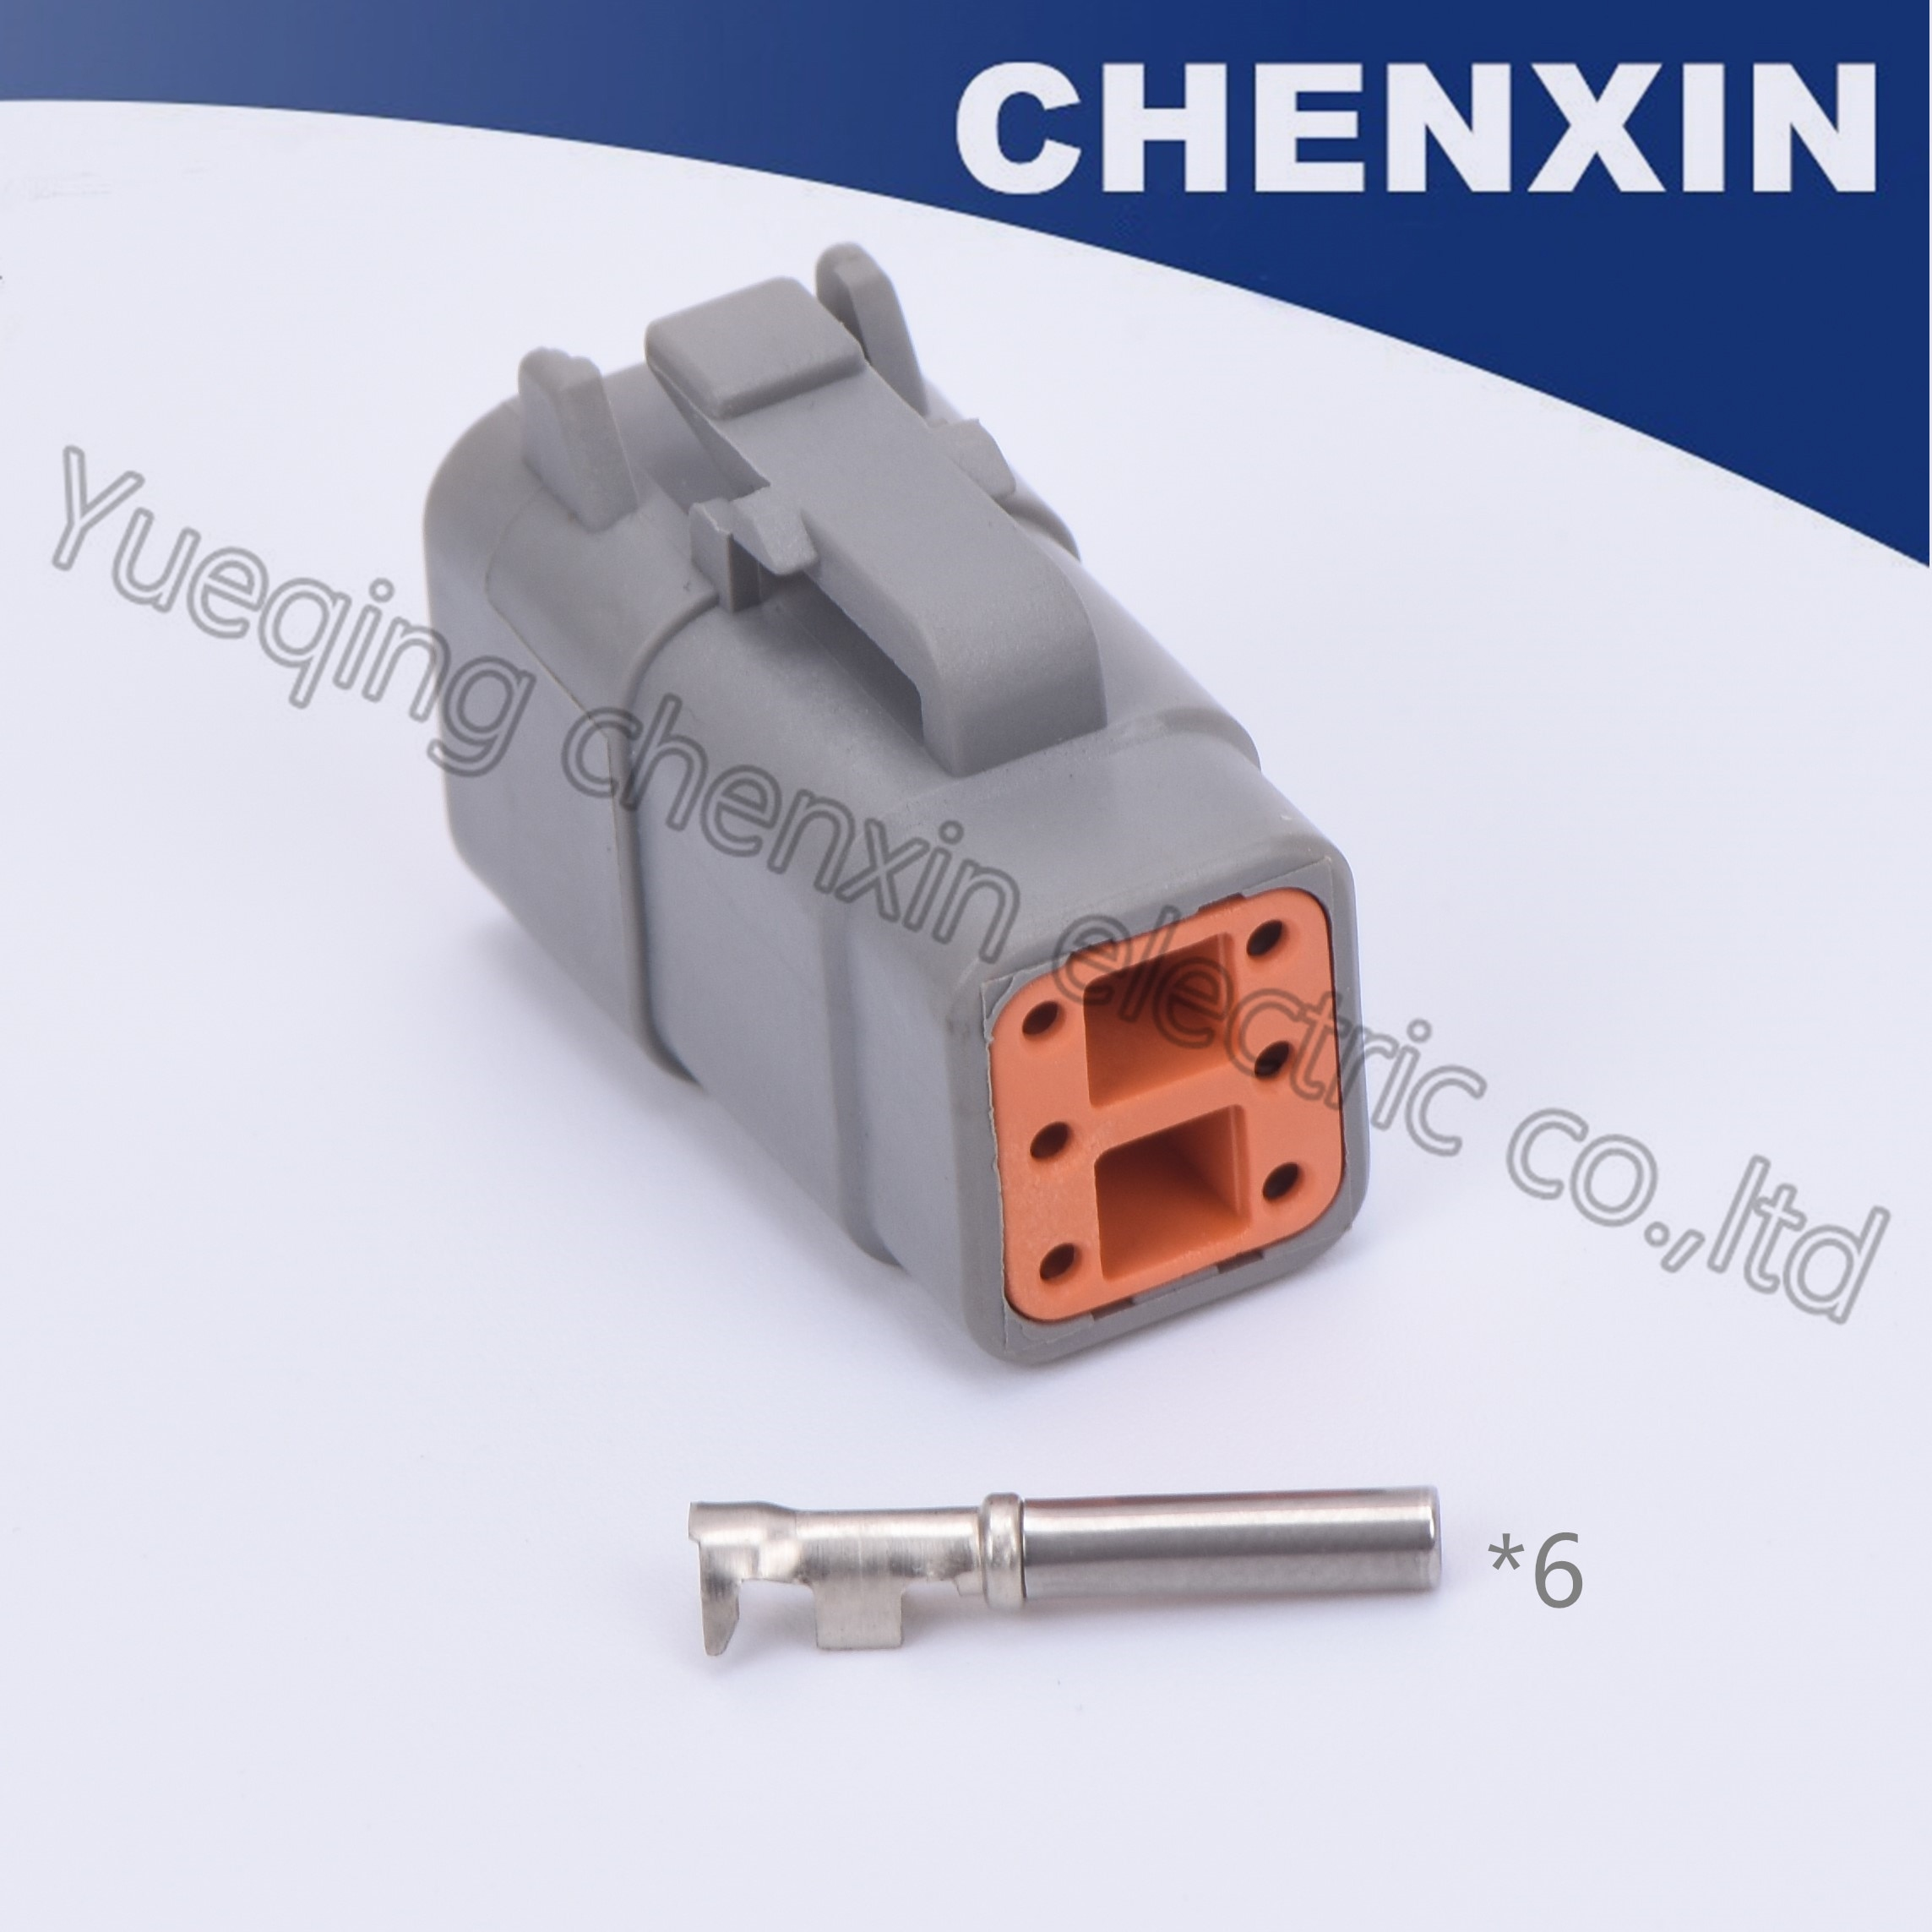 Conectores de automóvil impermeables grises de 6 pines para coche (clip naranja) Serie hembra 1,0 DTM con DTM06-6S de terminal de prensado estampado